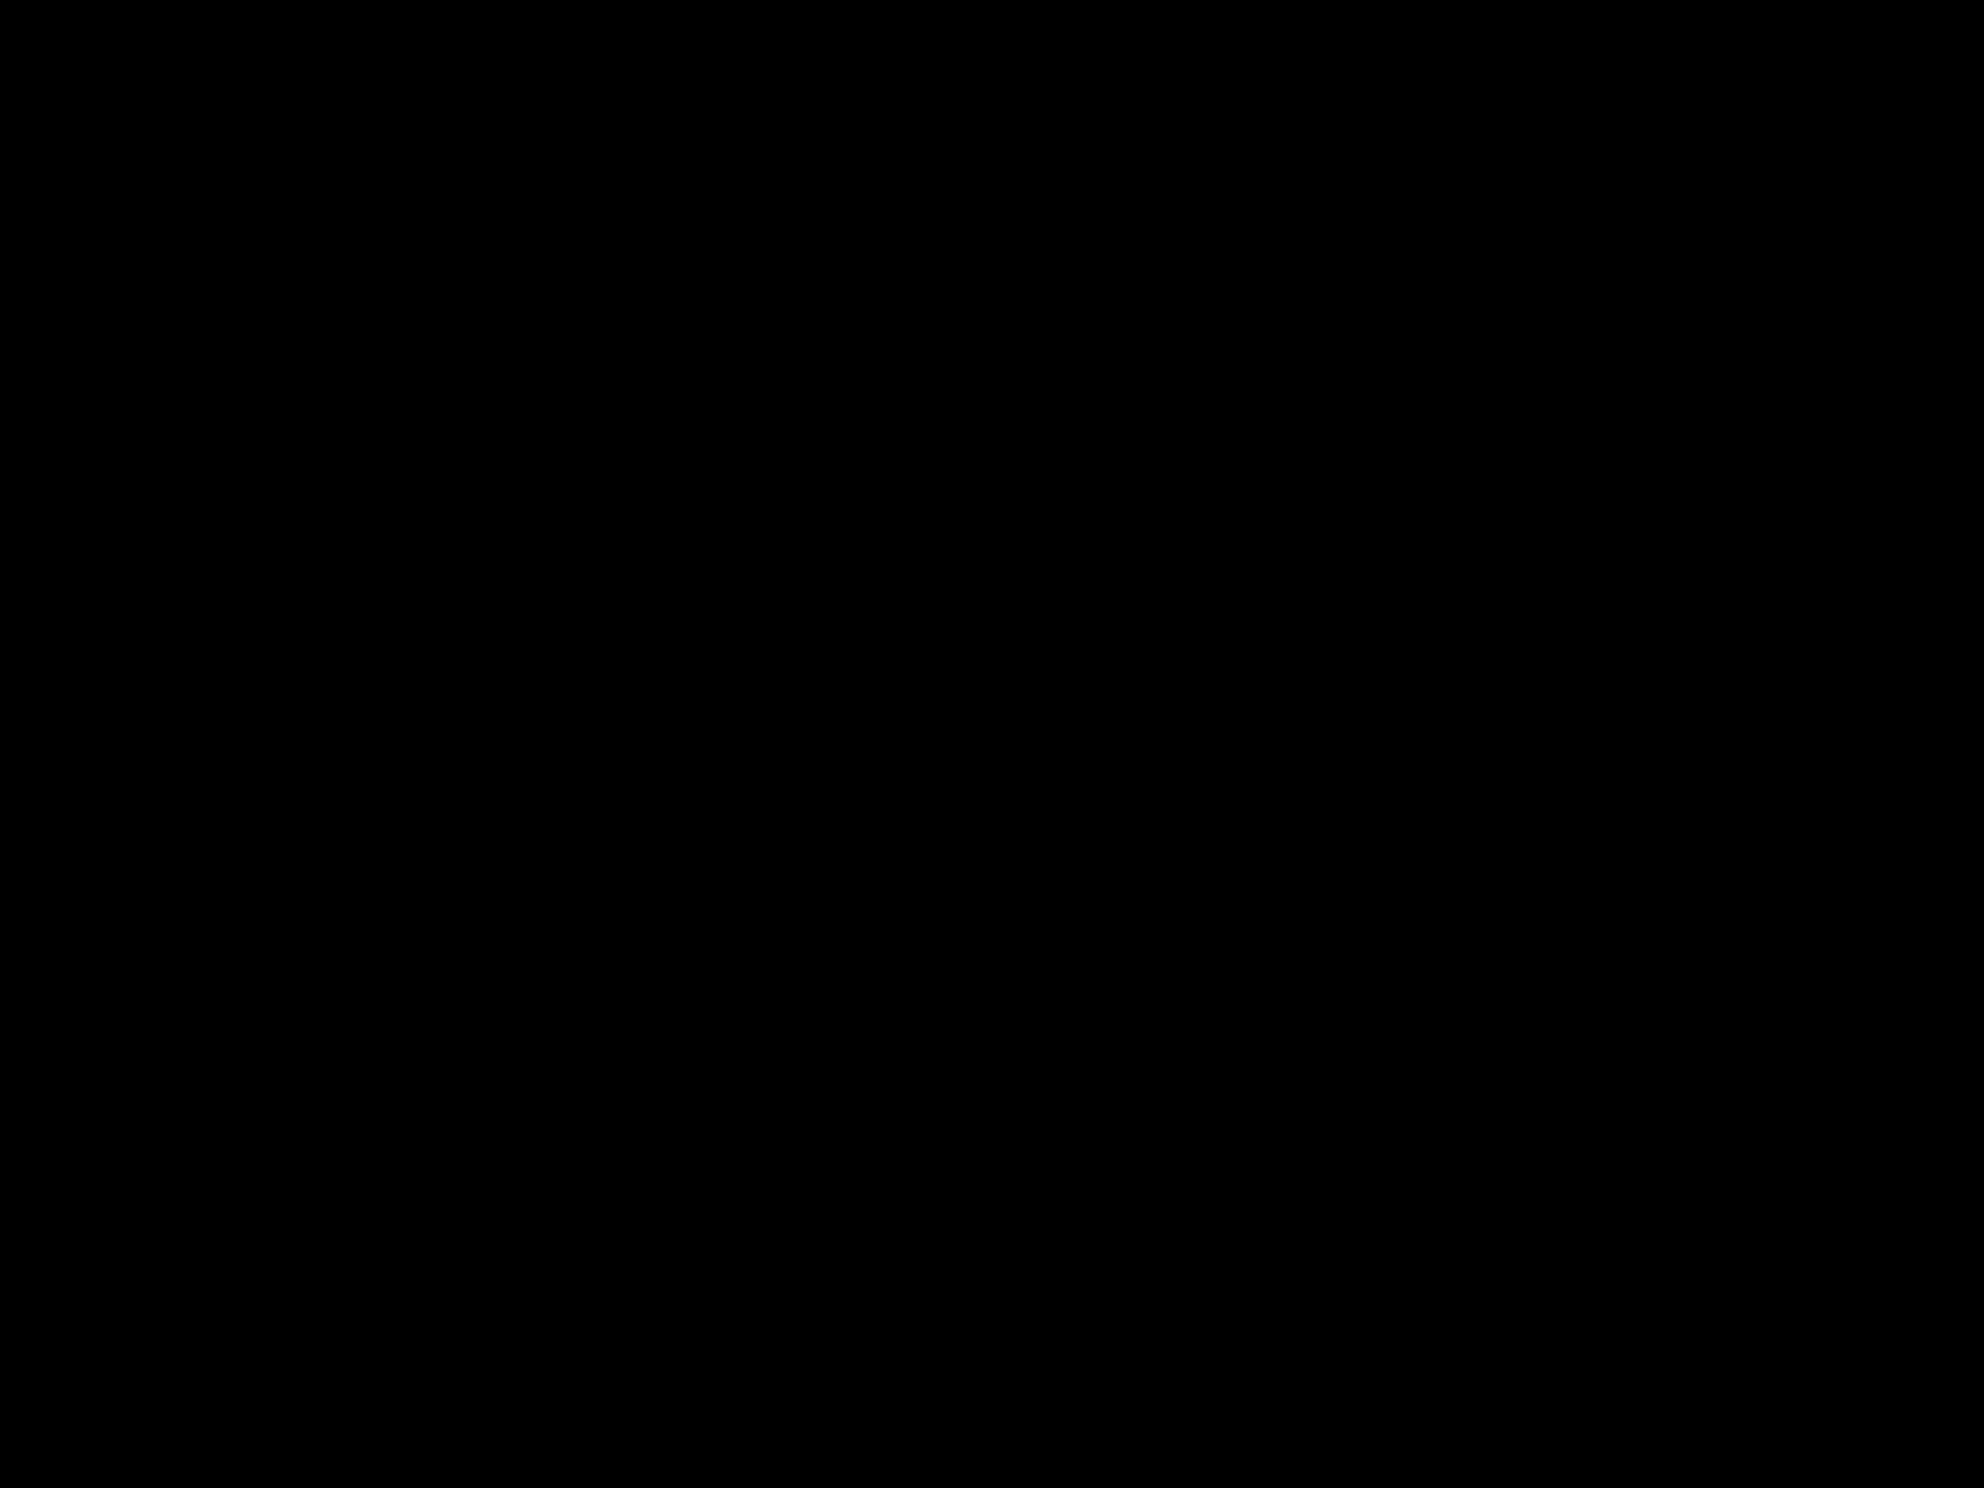 Unicorn Lineart : Unicorn lineart by miroax on deviantart